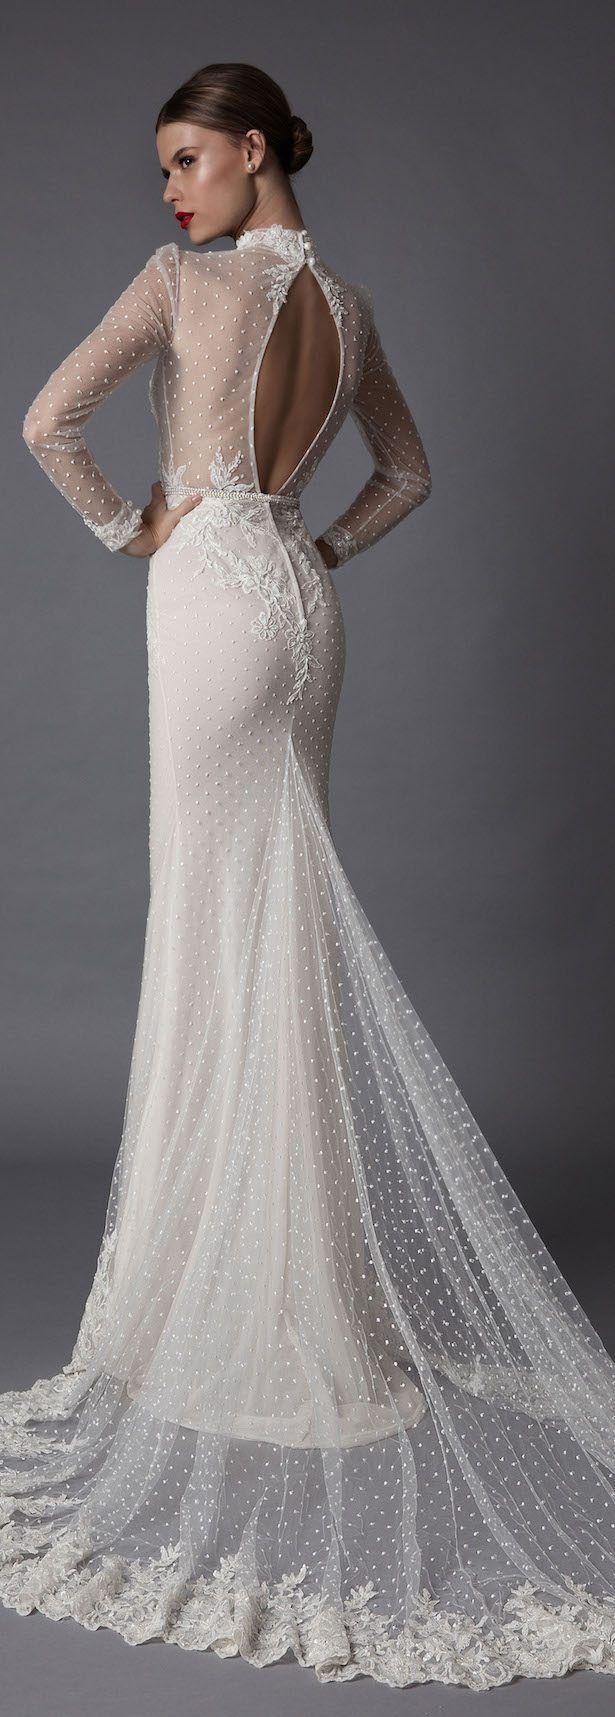 Best wedding dresses of long sleeve wedding dresses